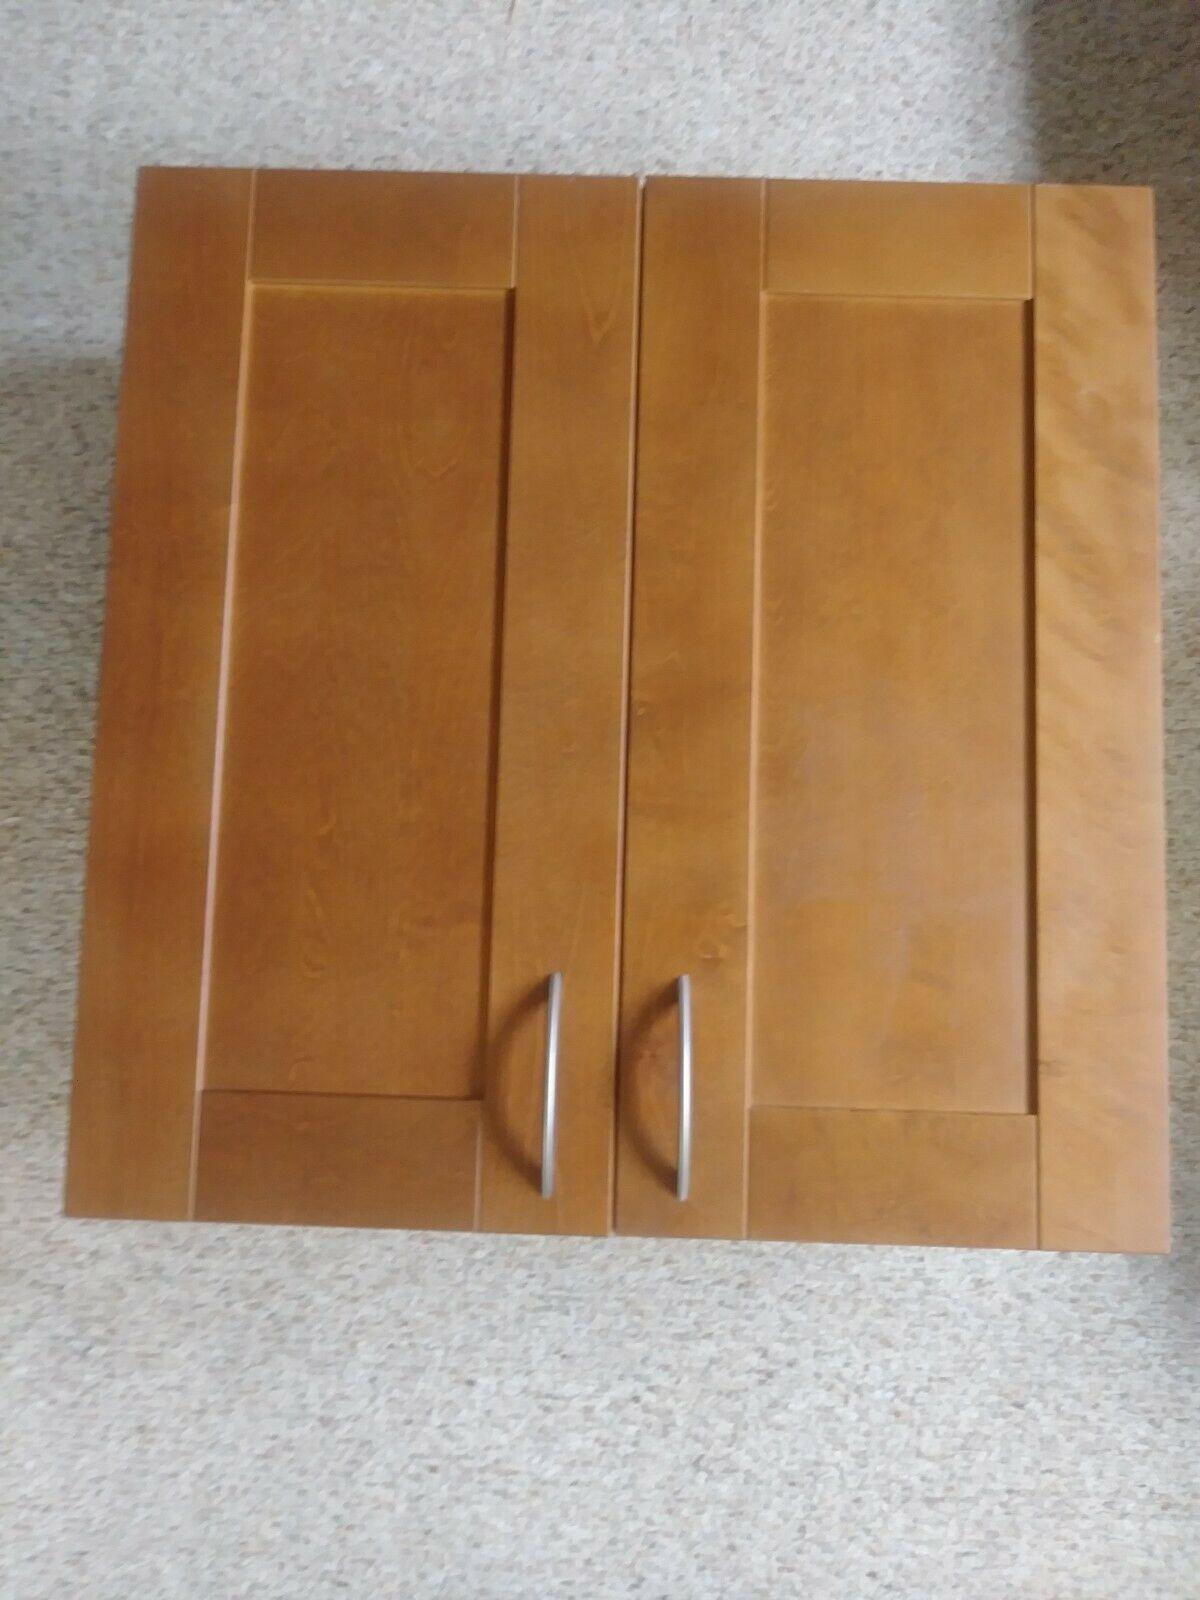 Ikea Cabinet Doors In 2020 Ikea Kitchen Installation Ikea Cabinets Cabinet Doors